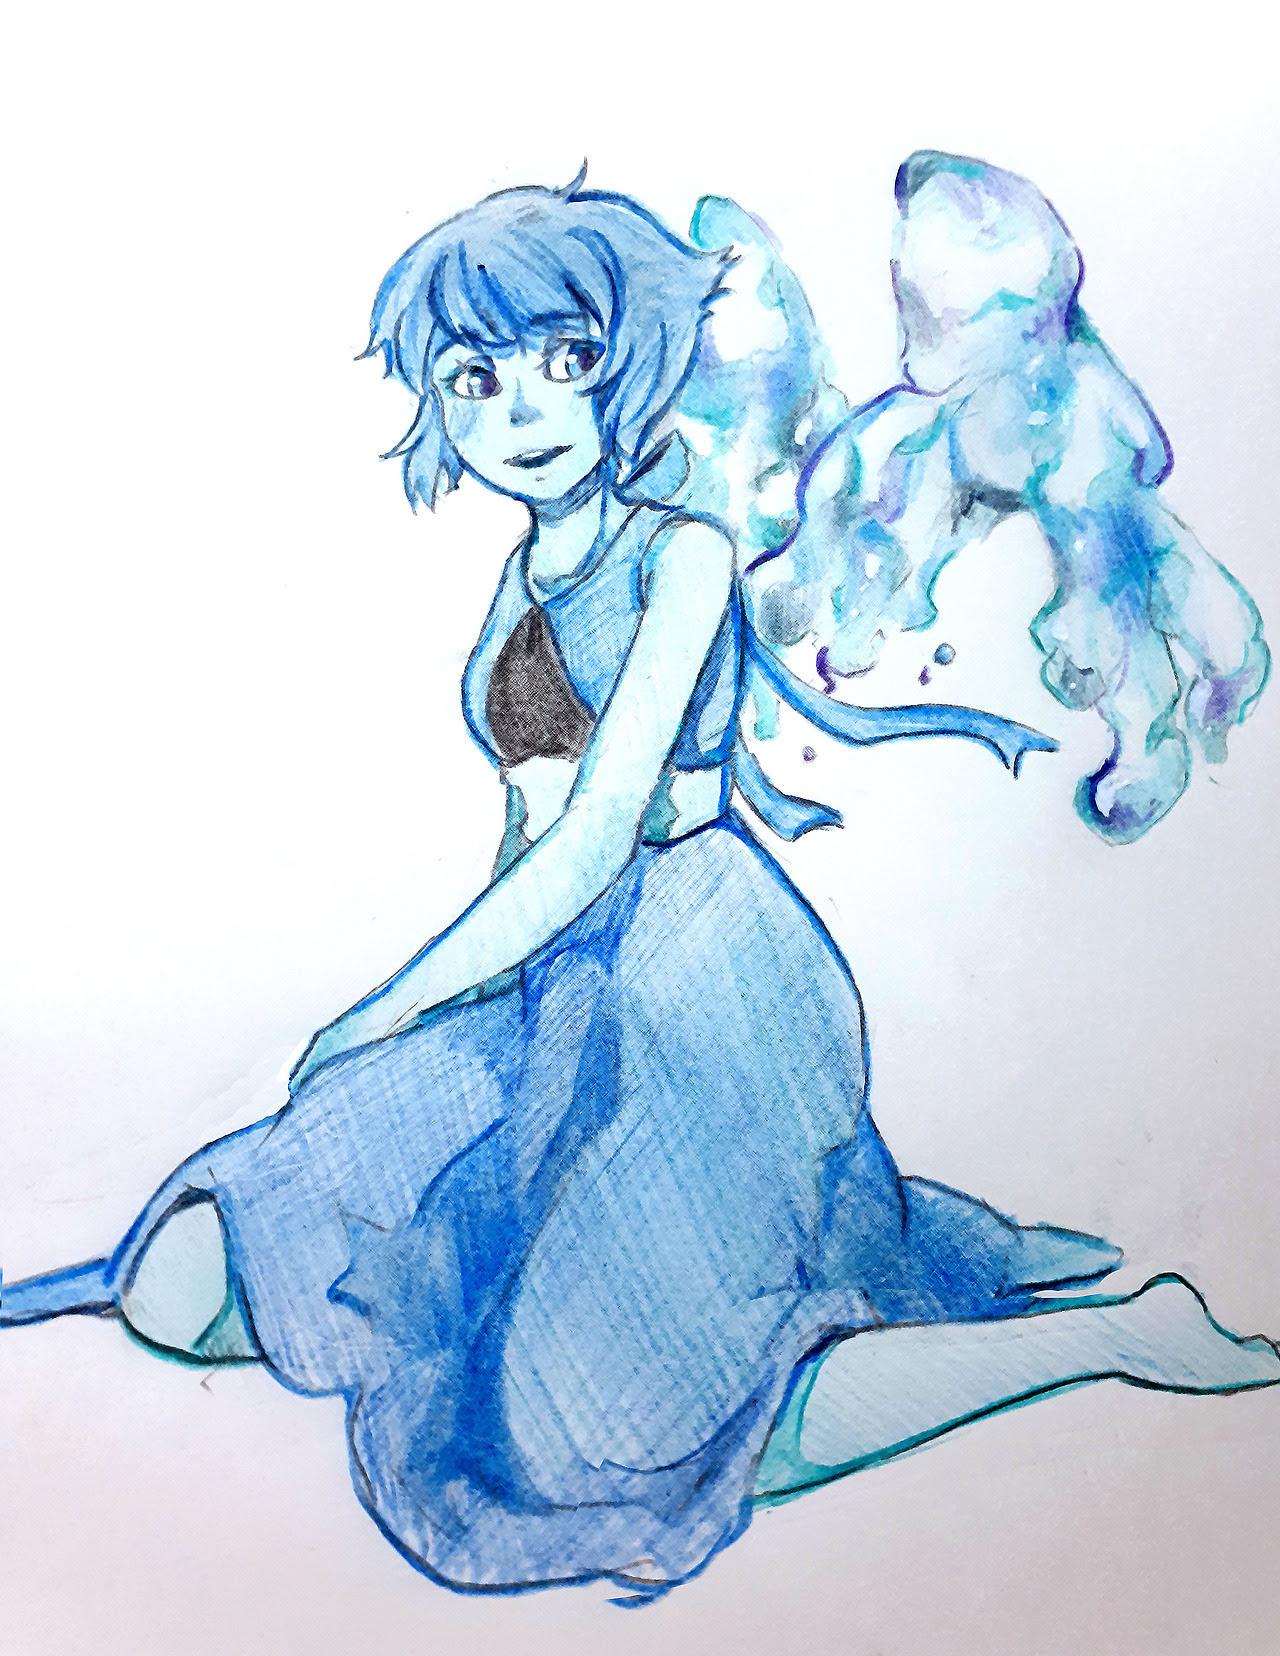 Lapis in my doodle art